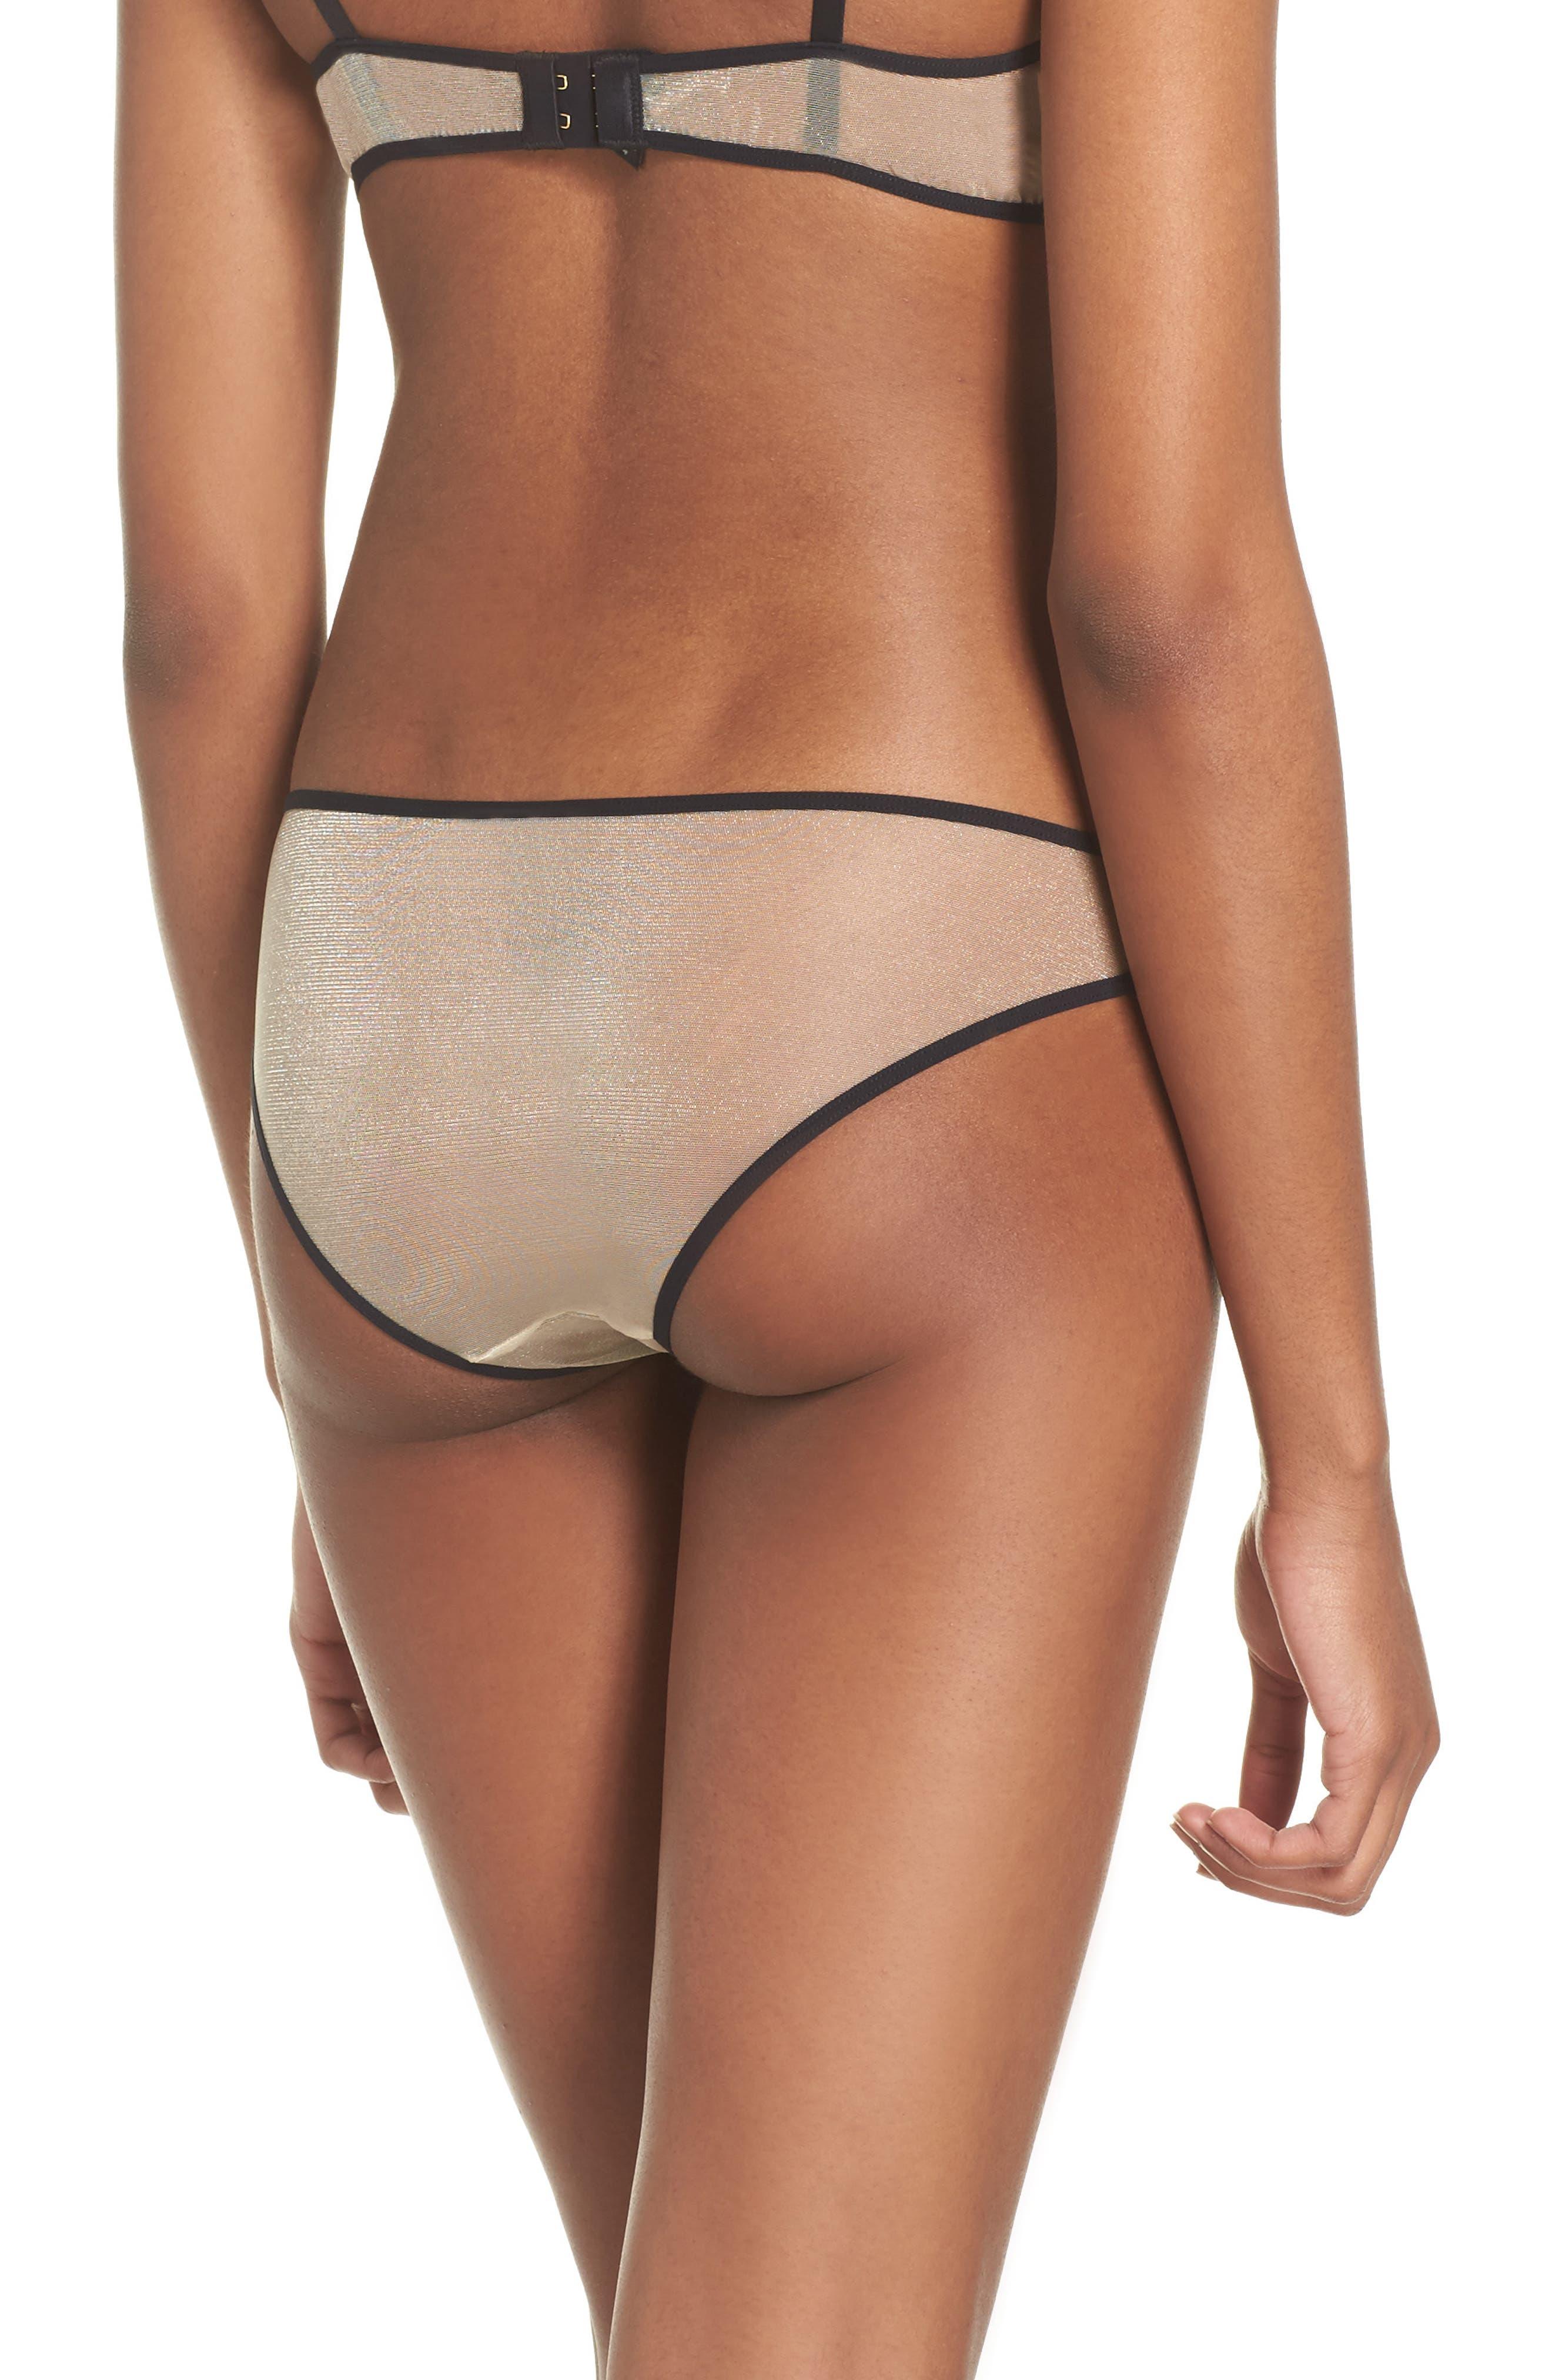 L'Antichambre Sheer Panties,                             Alternate thumbnail 2, color,                             Black / Nude